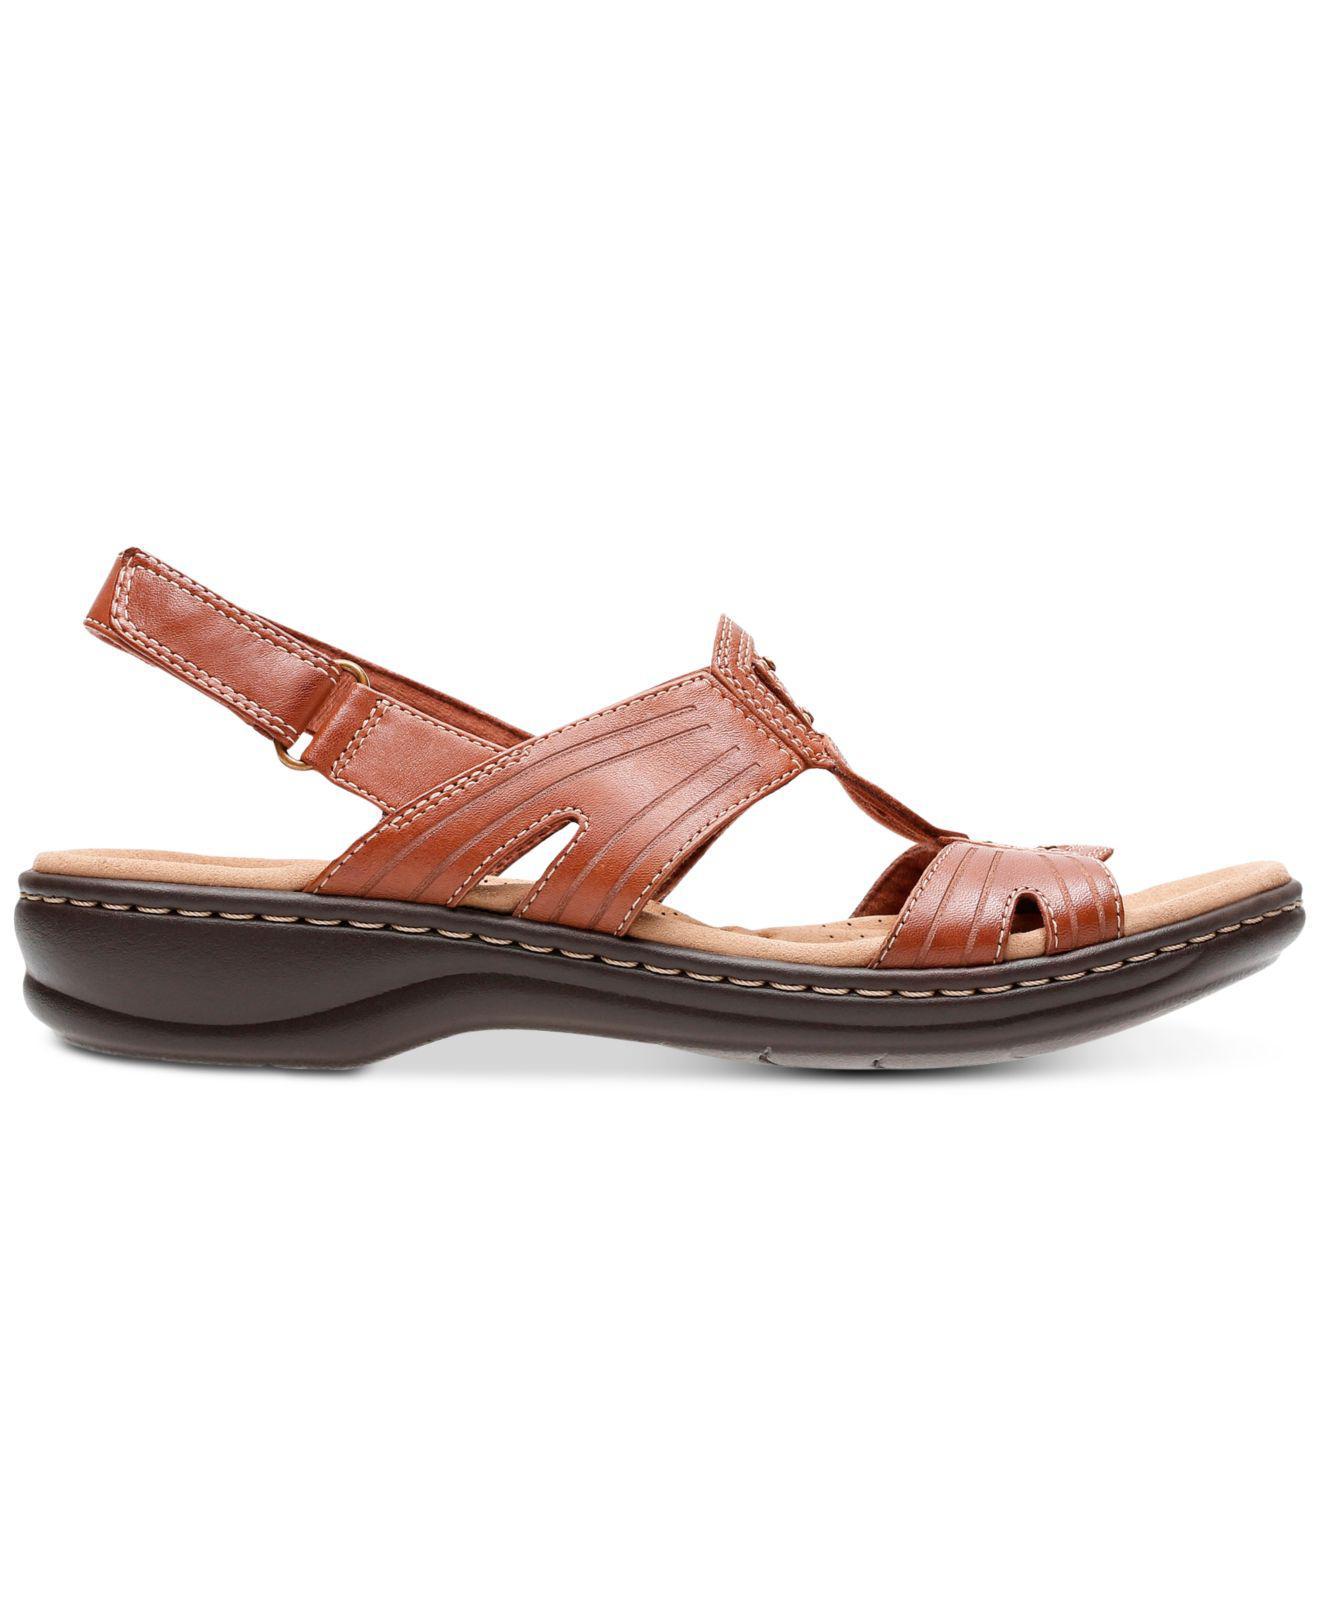 393352e29ae9 Lyst - Clarks Leisa Vine Sandals in Brown